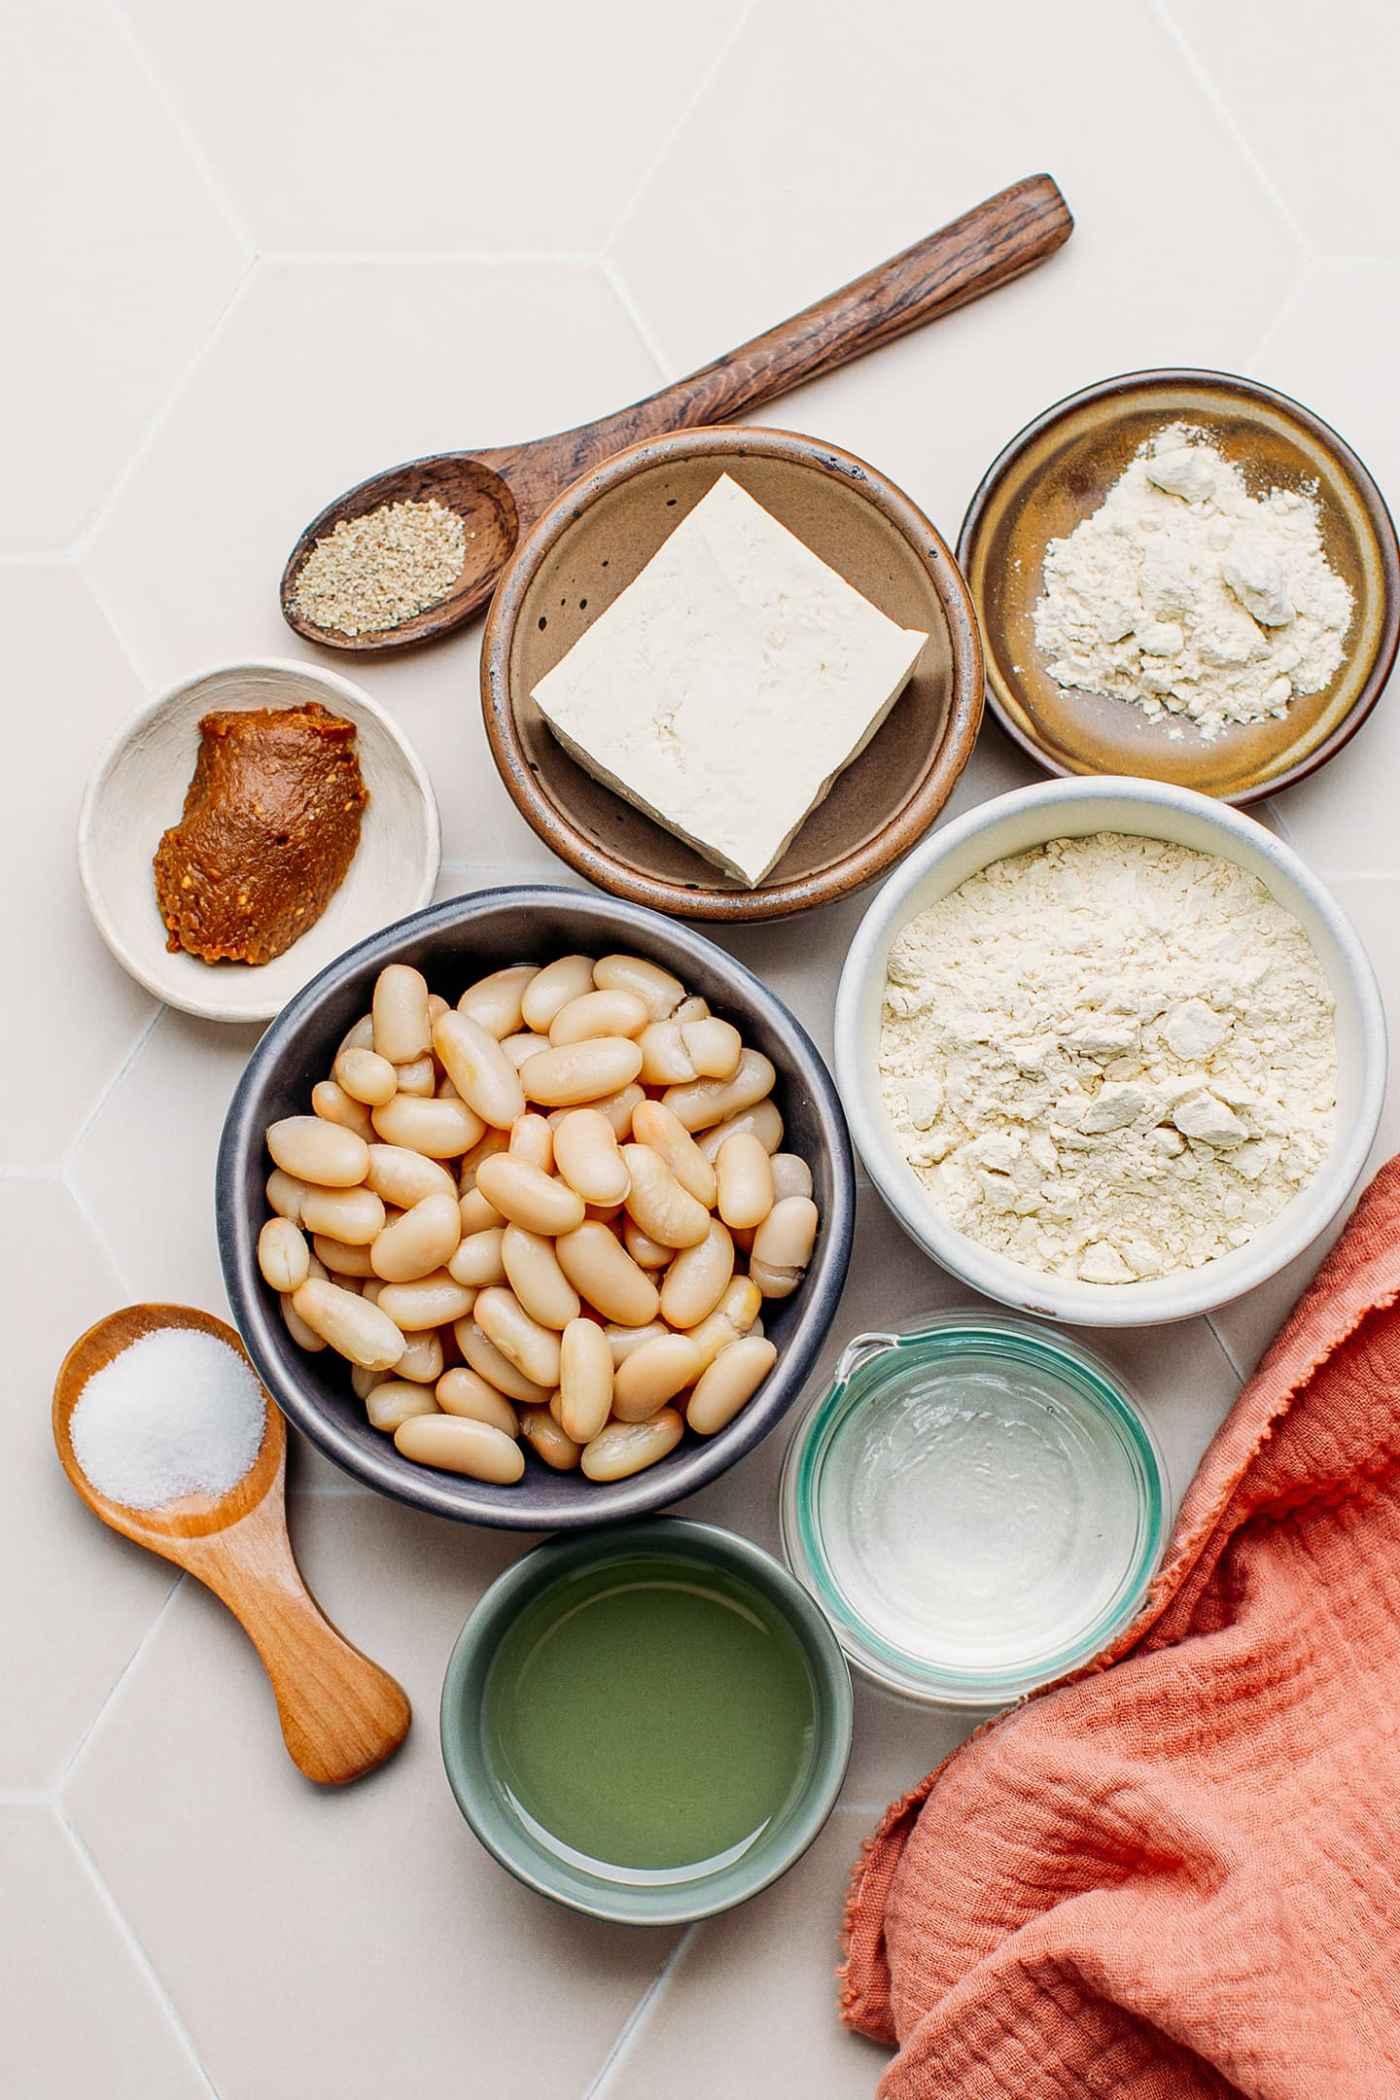 Ingredients to make vegan chicken, jackfruit, tofu, vital wheat gluten.